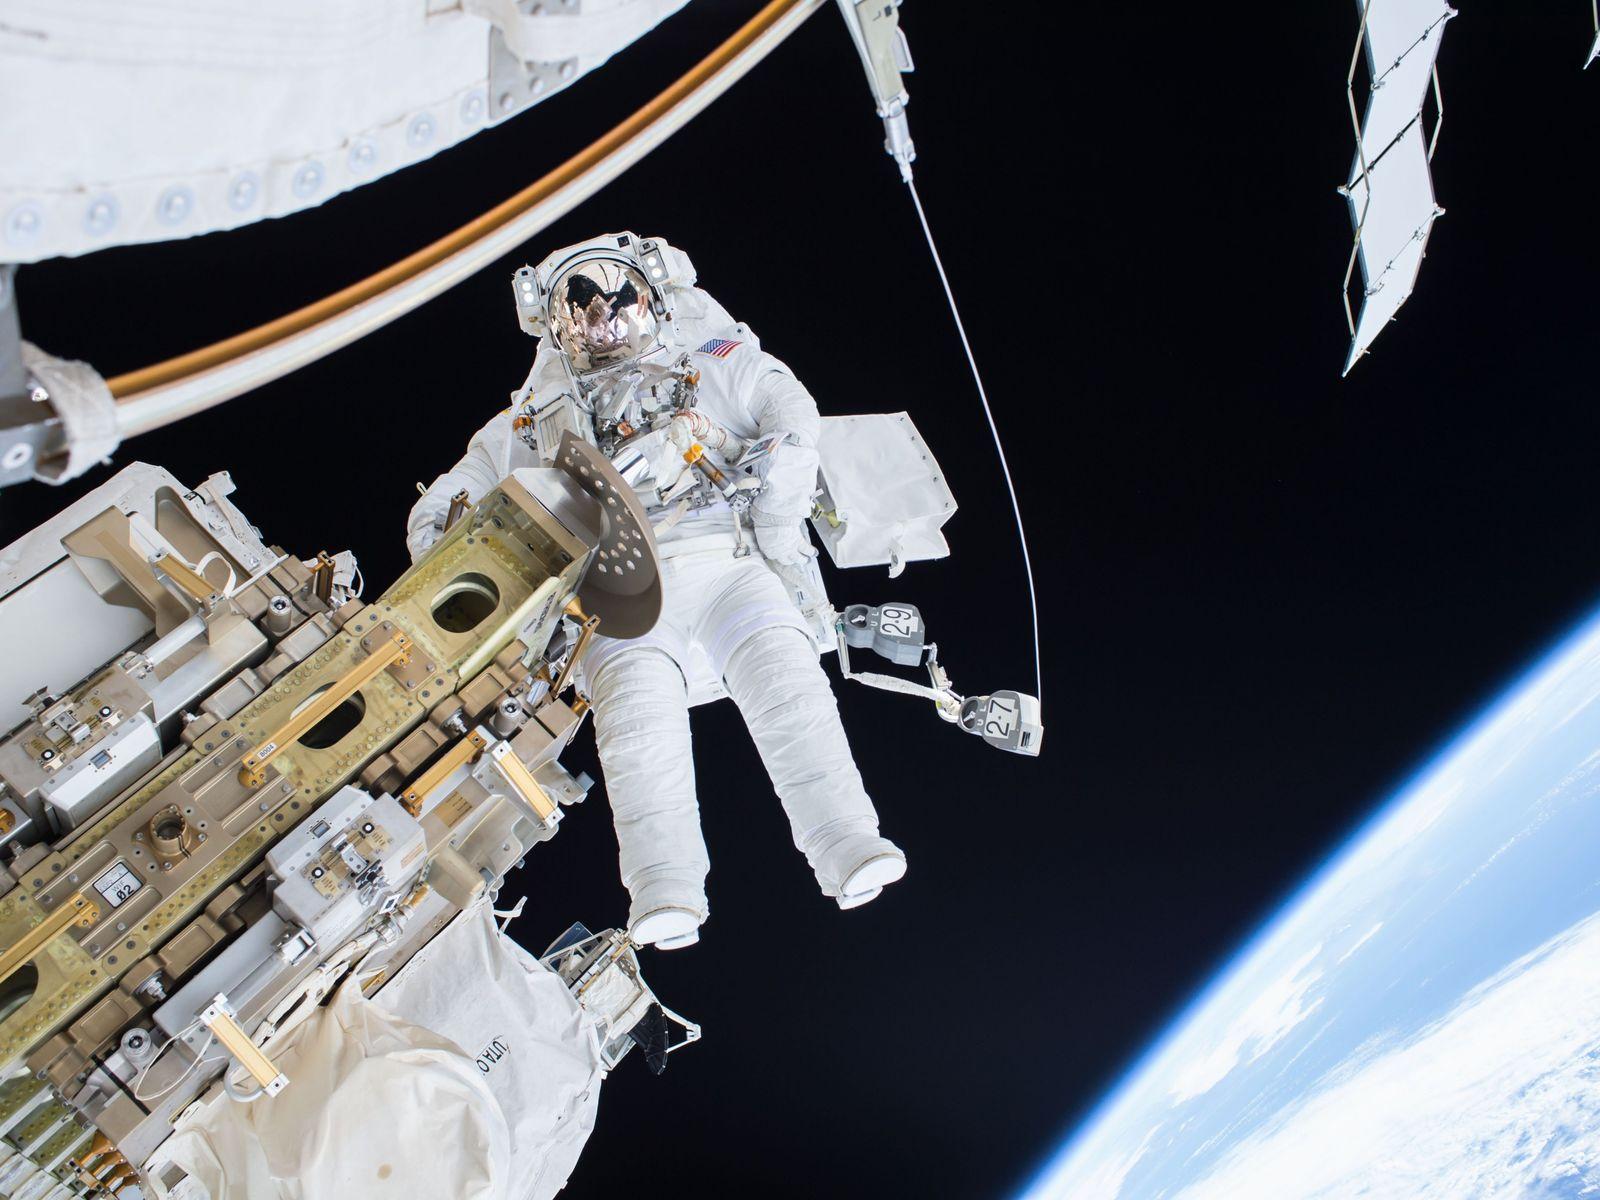 NASA astronaut Tim Kopra floats alongside the International Space Station during a spacewalk.